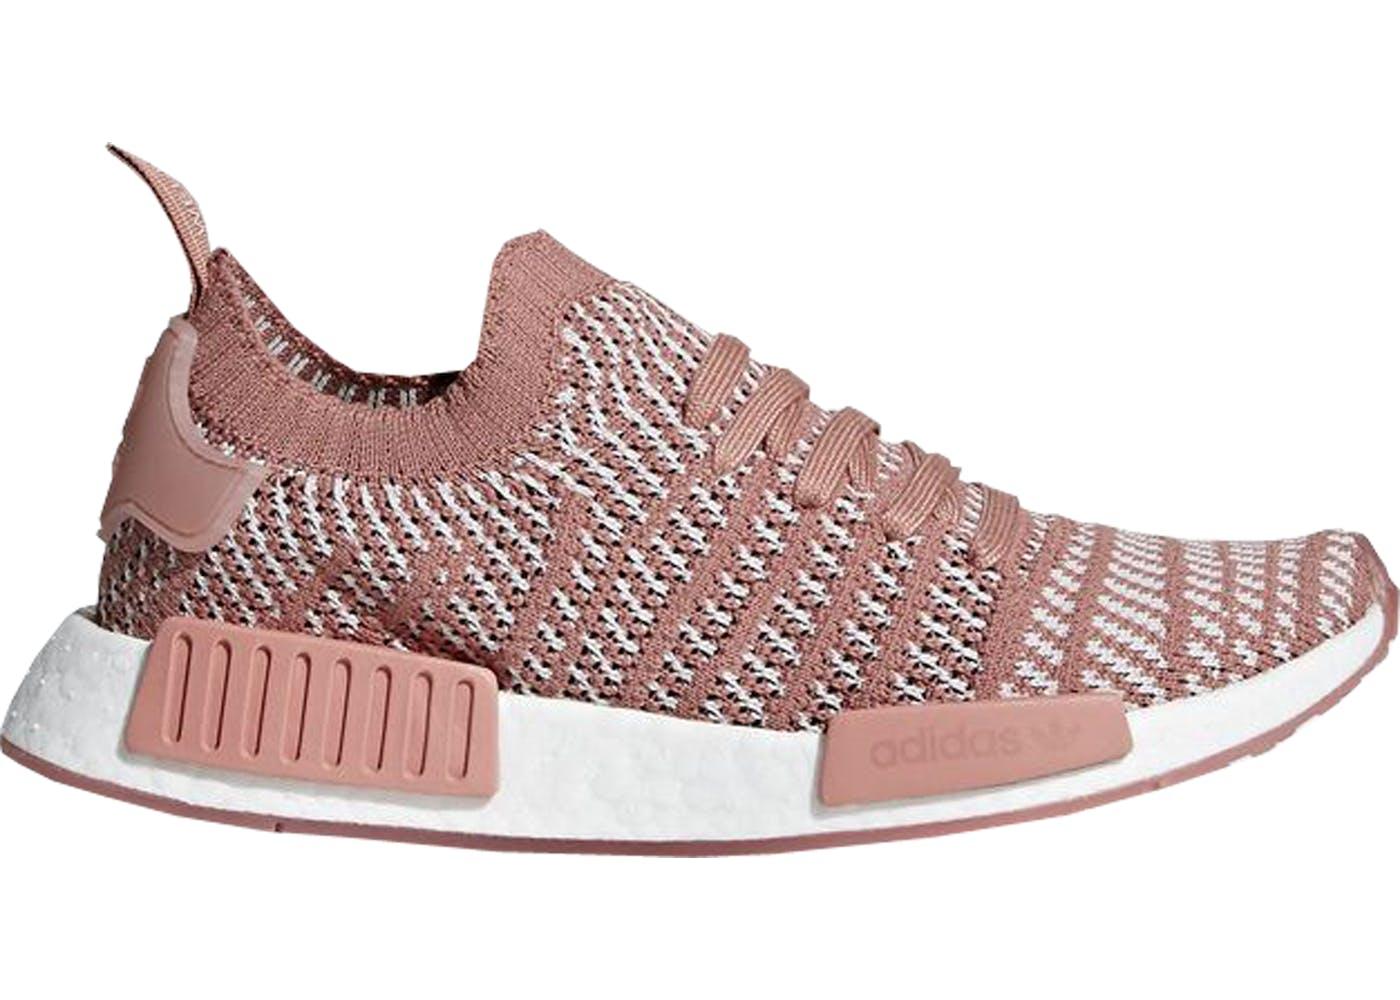 UA Adidas NMD R1 PK Monochrome sneakeruns